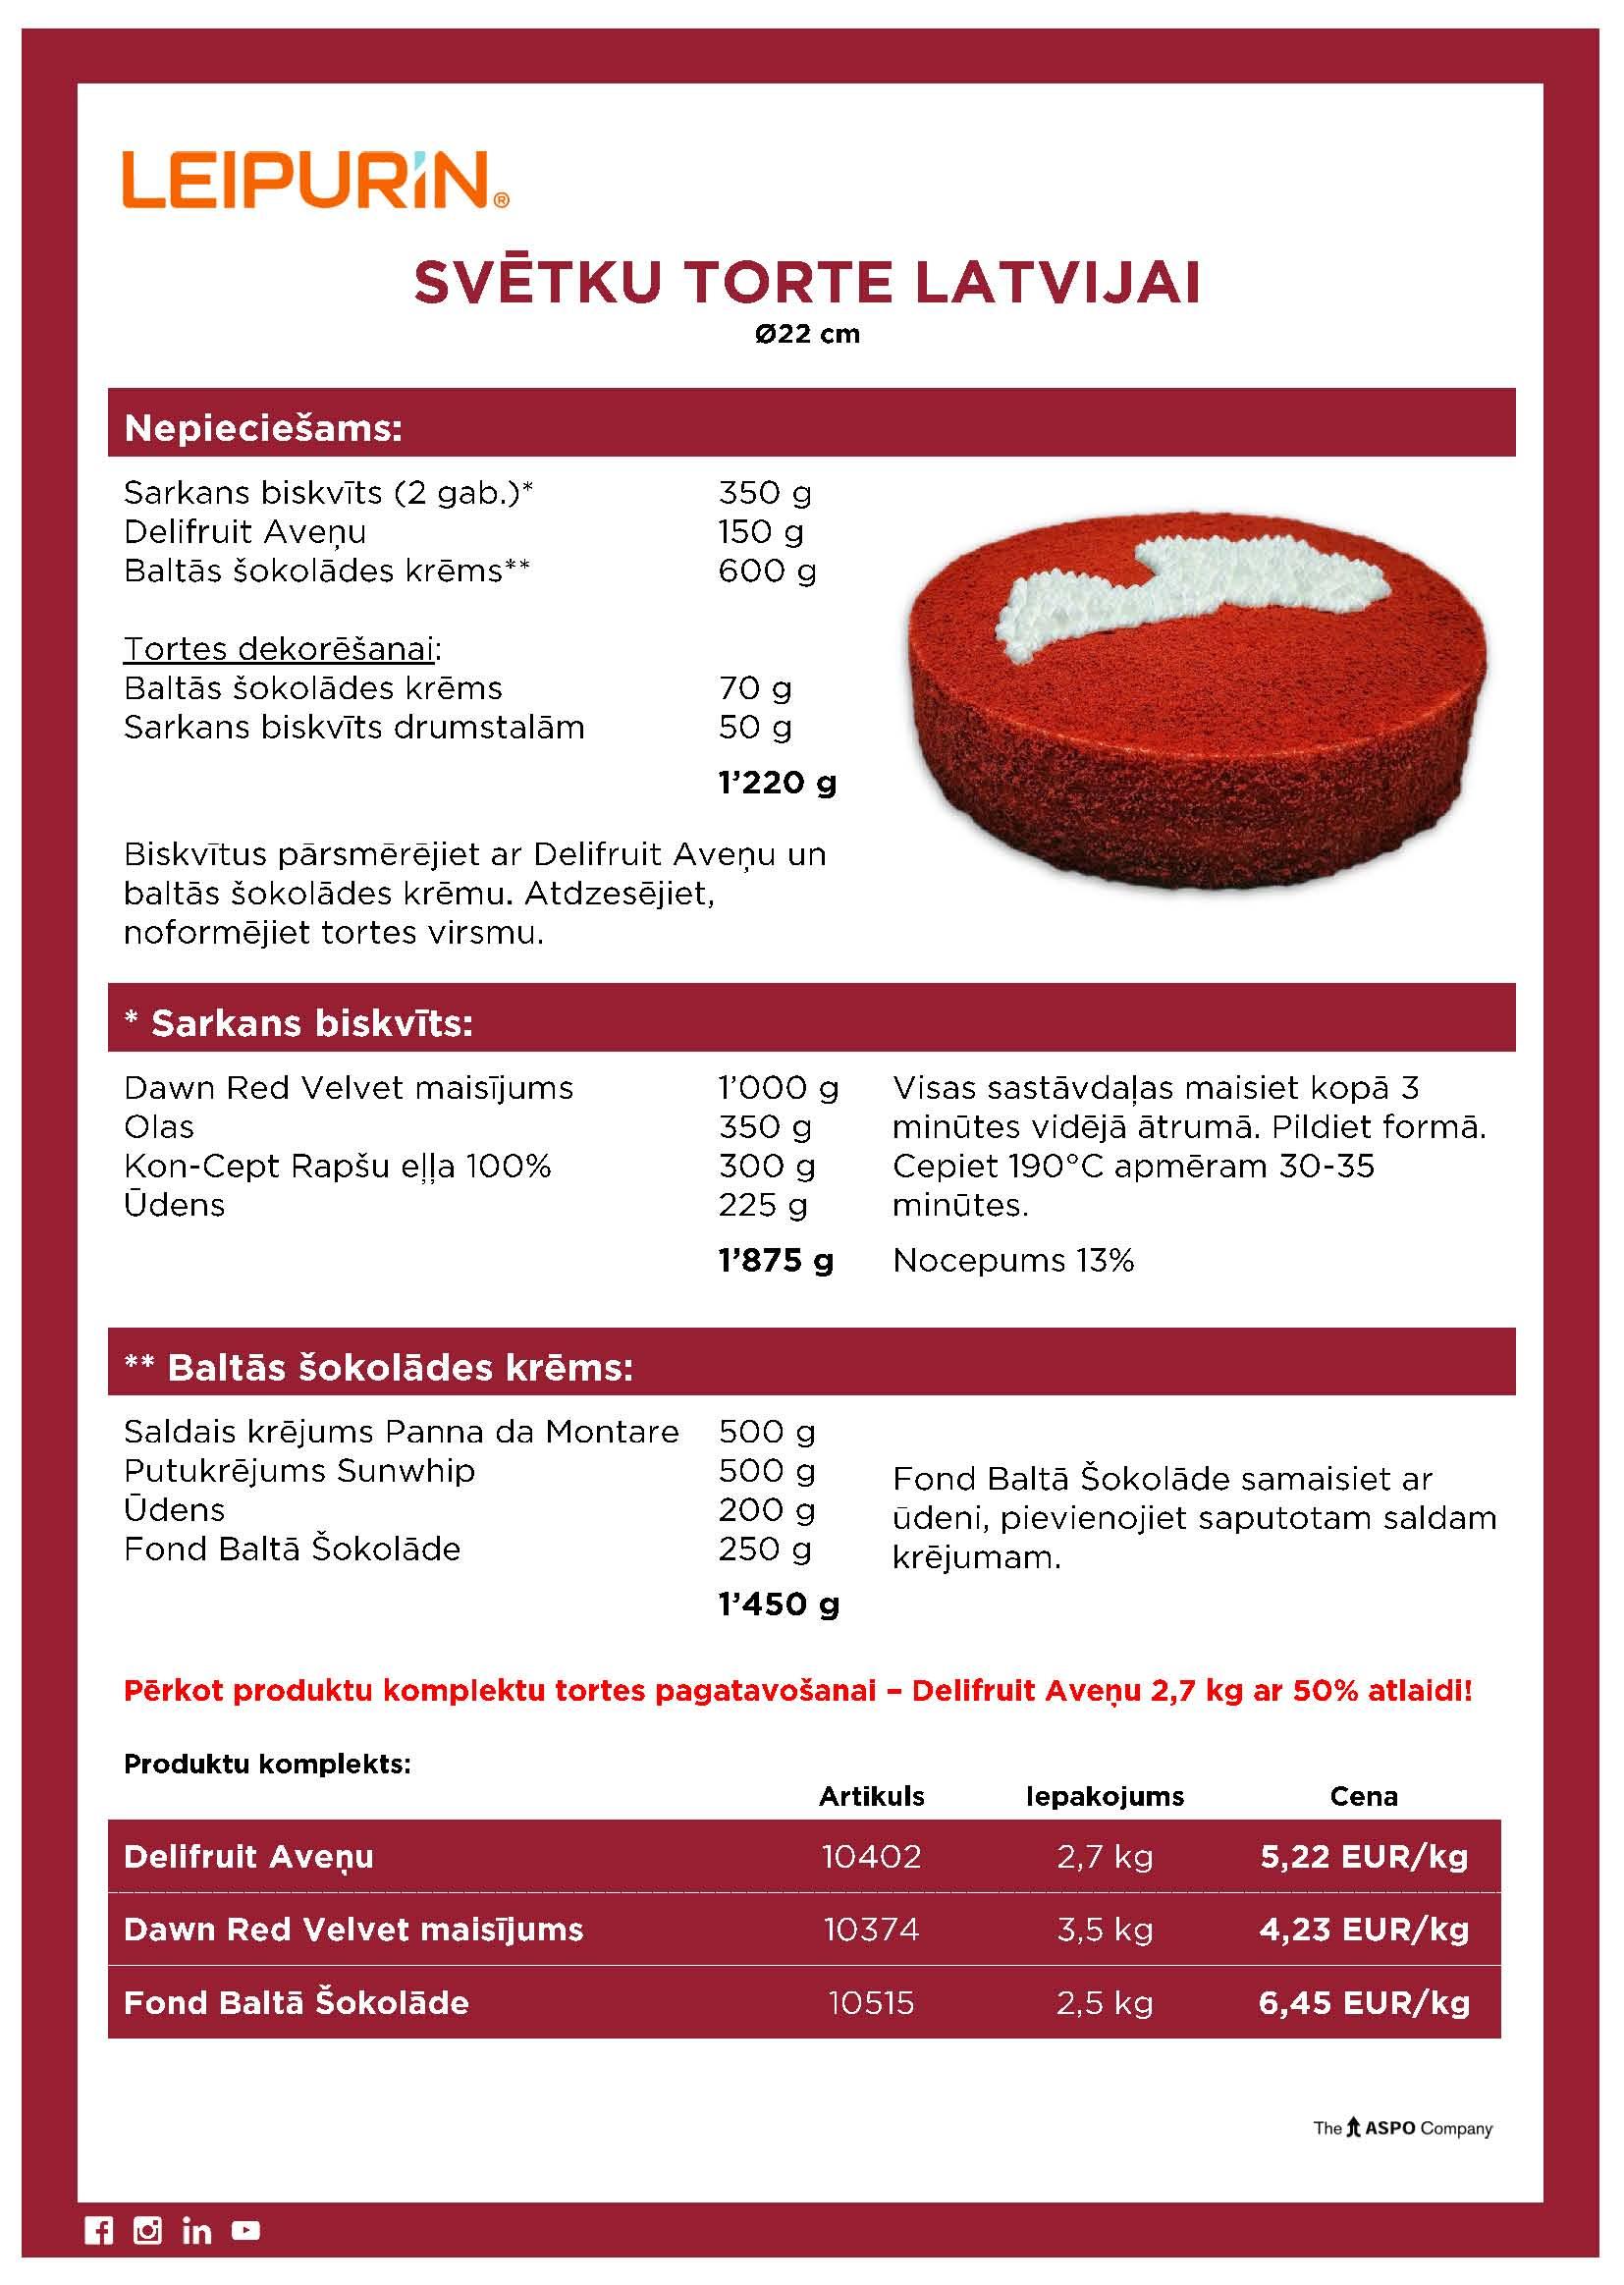 2019.11.06 Sveetku torte